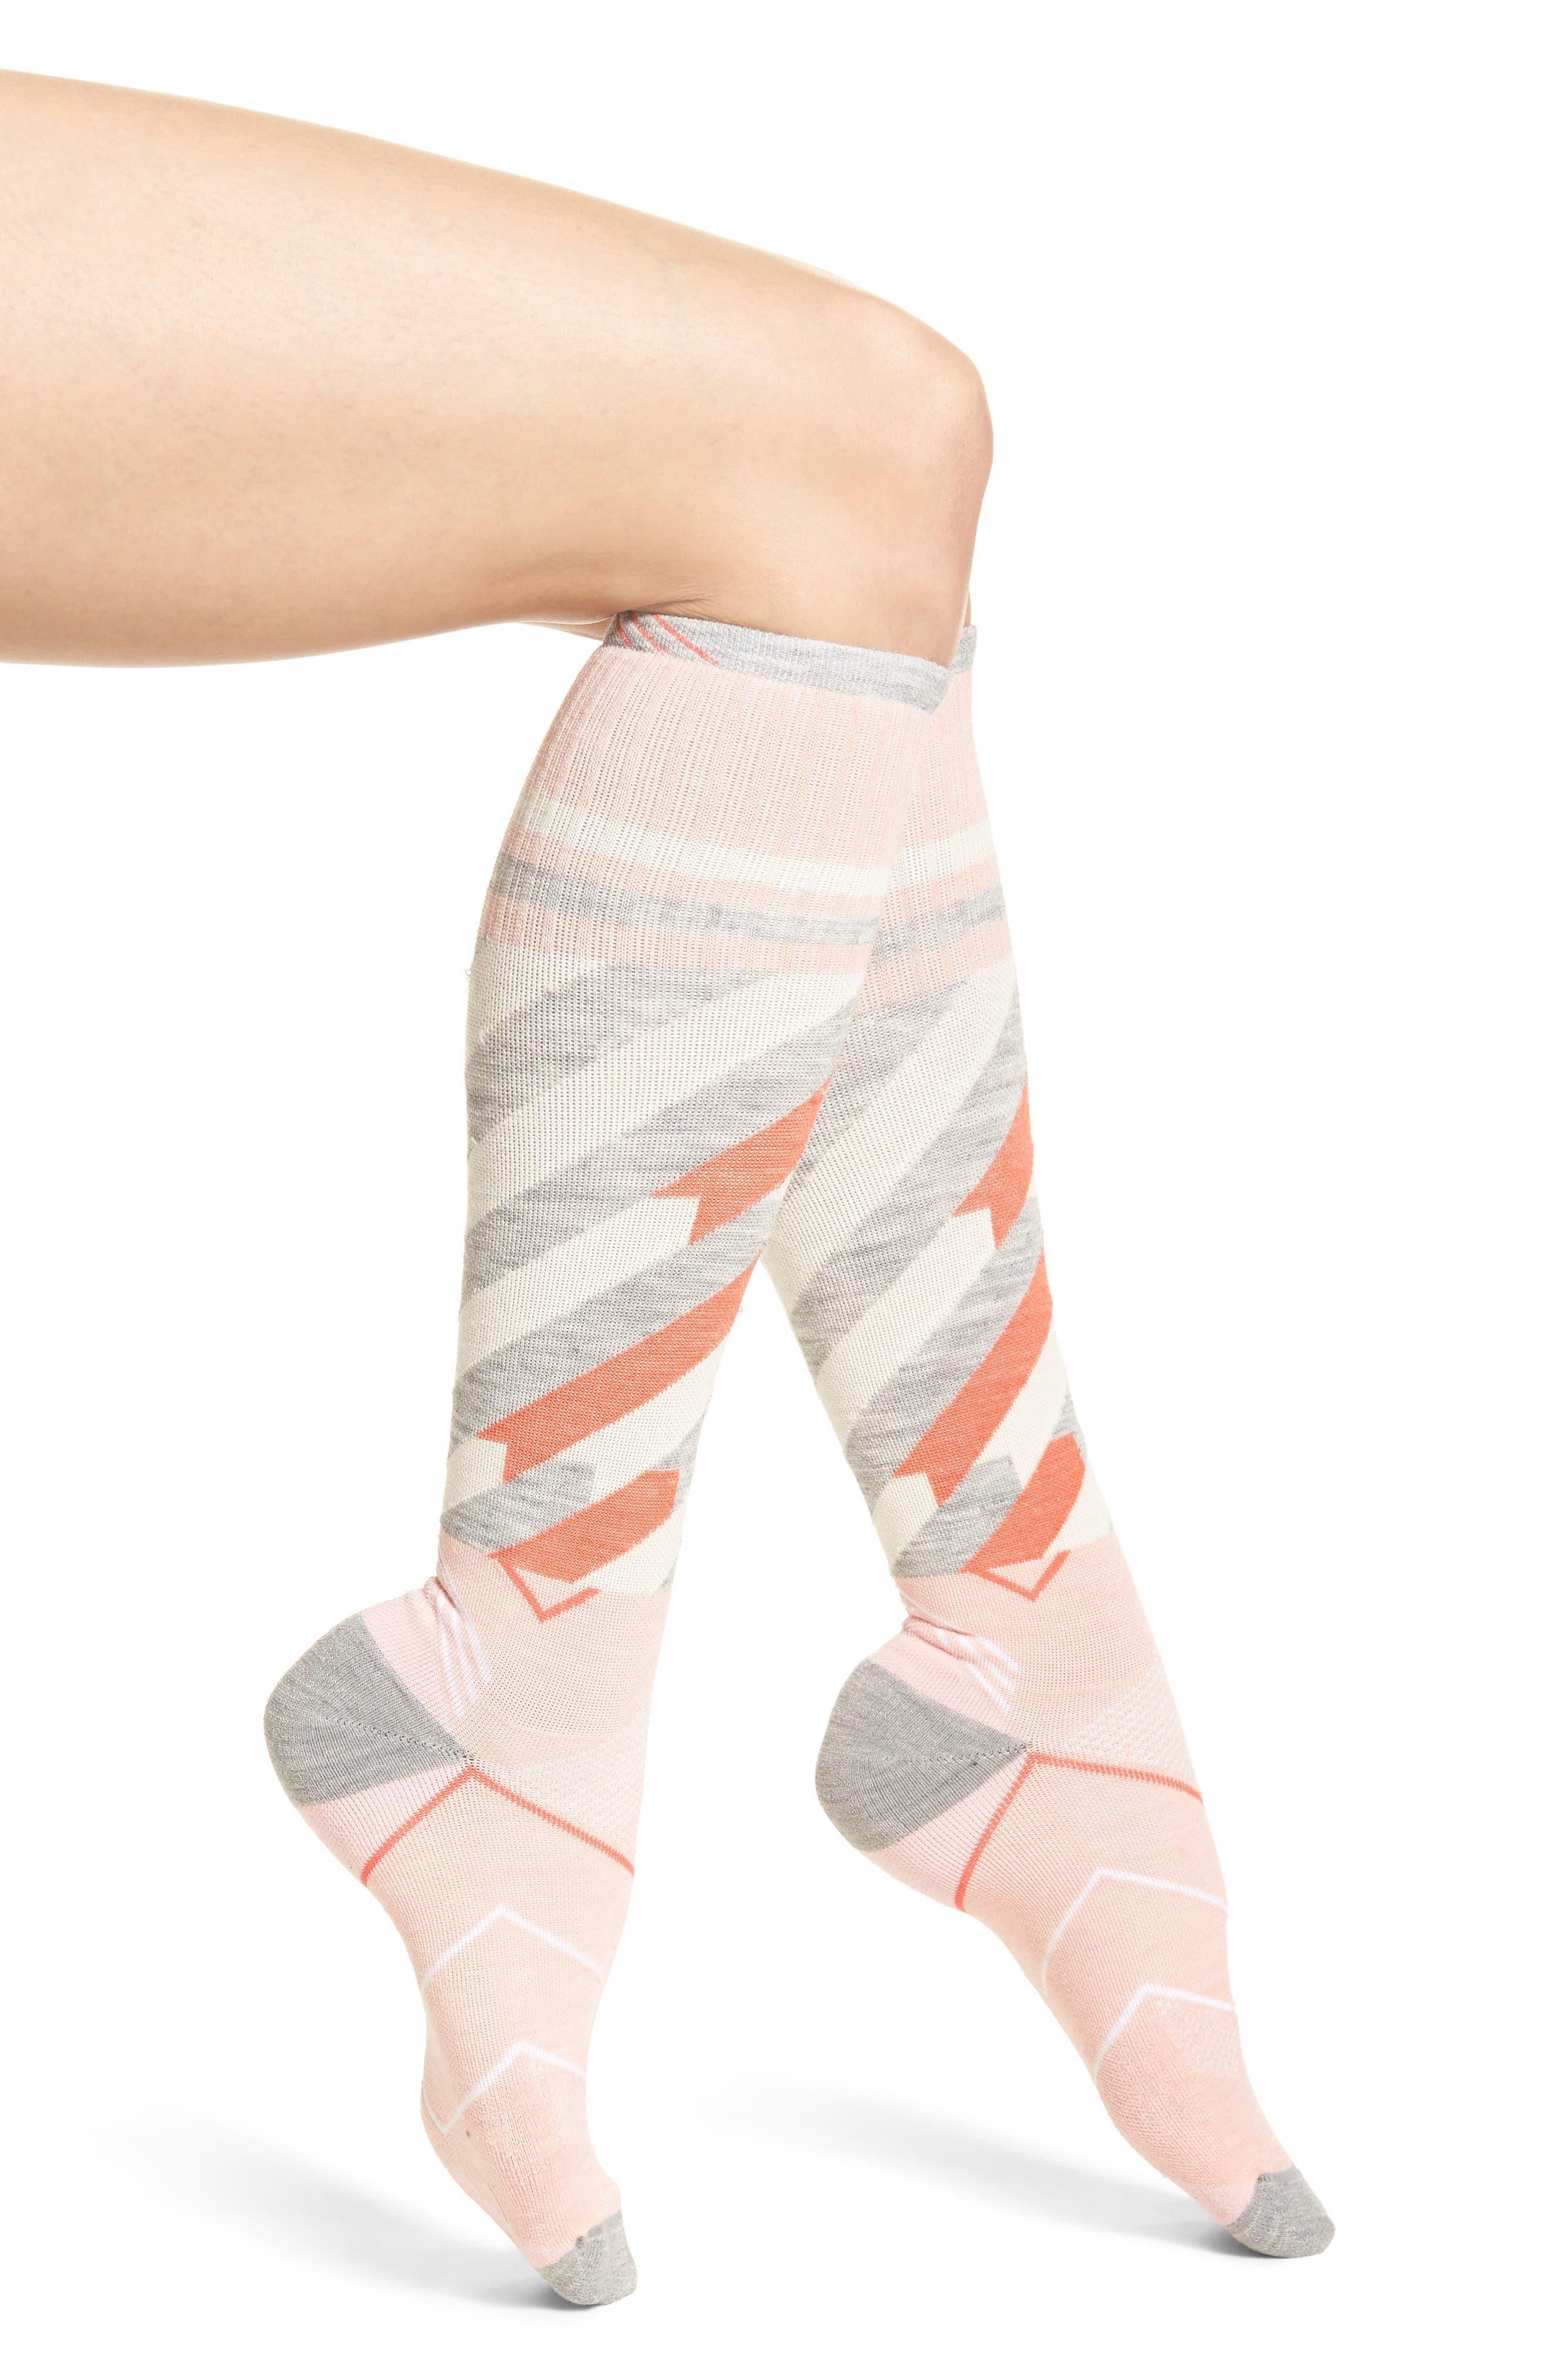 Cyclone Compression Knee Socks,                             Main thumbnail 1, color,                             Rose